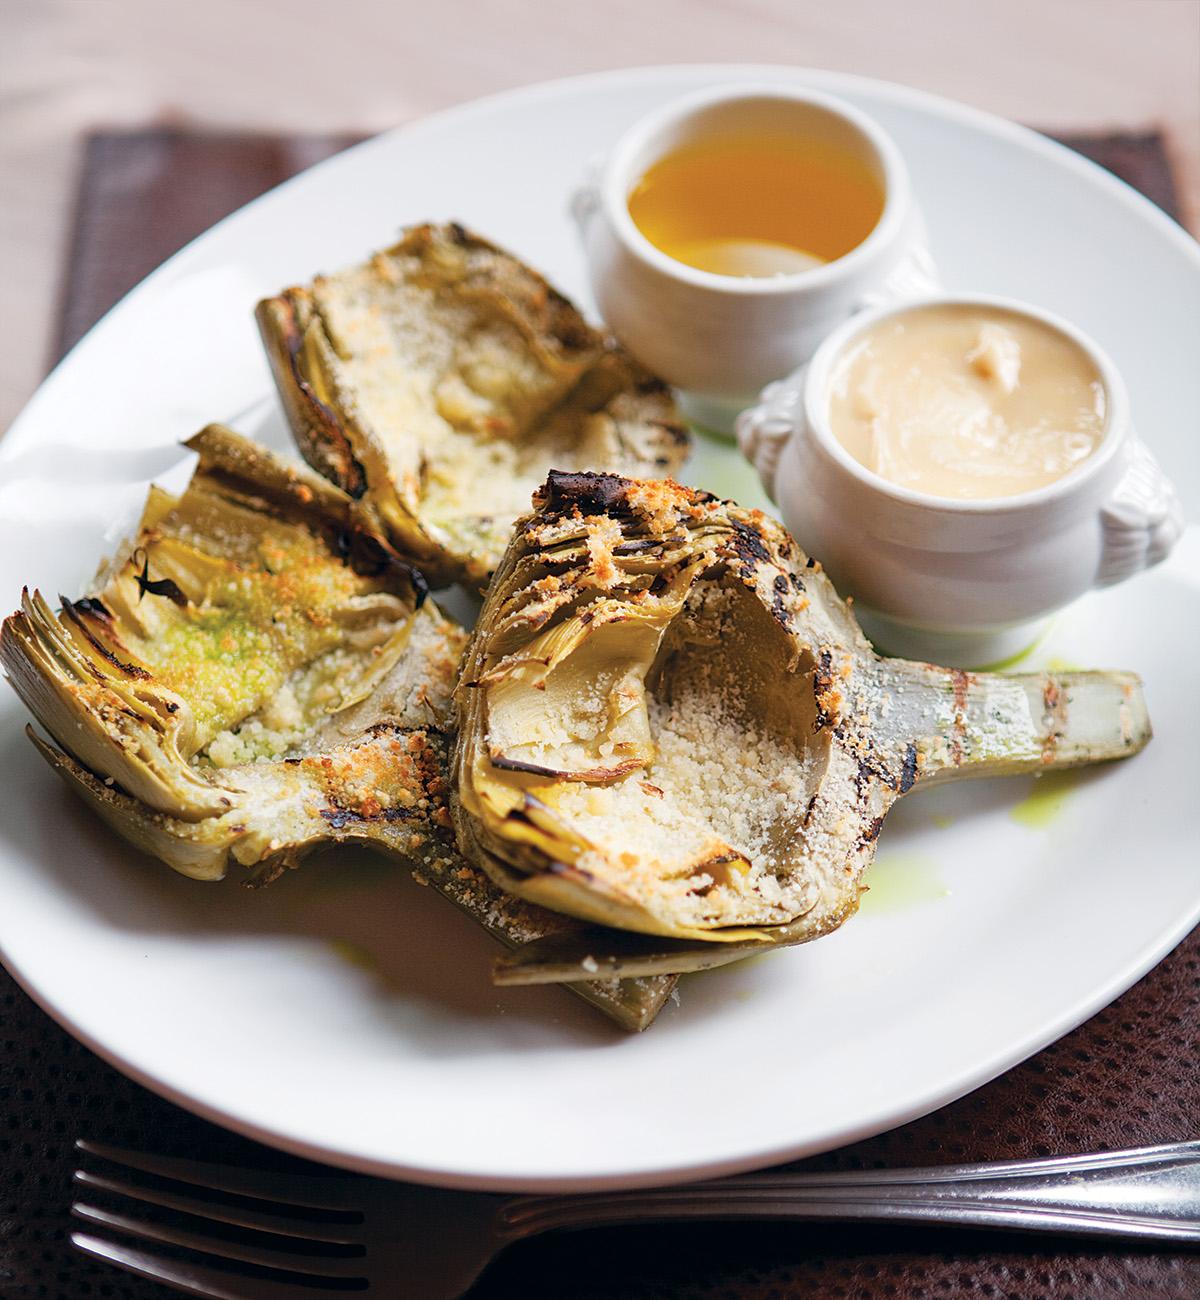 Jumbo grilled artichokes with roasted garlic aioli, $12. Photograph by Keller + Keller.